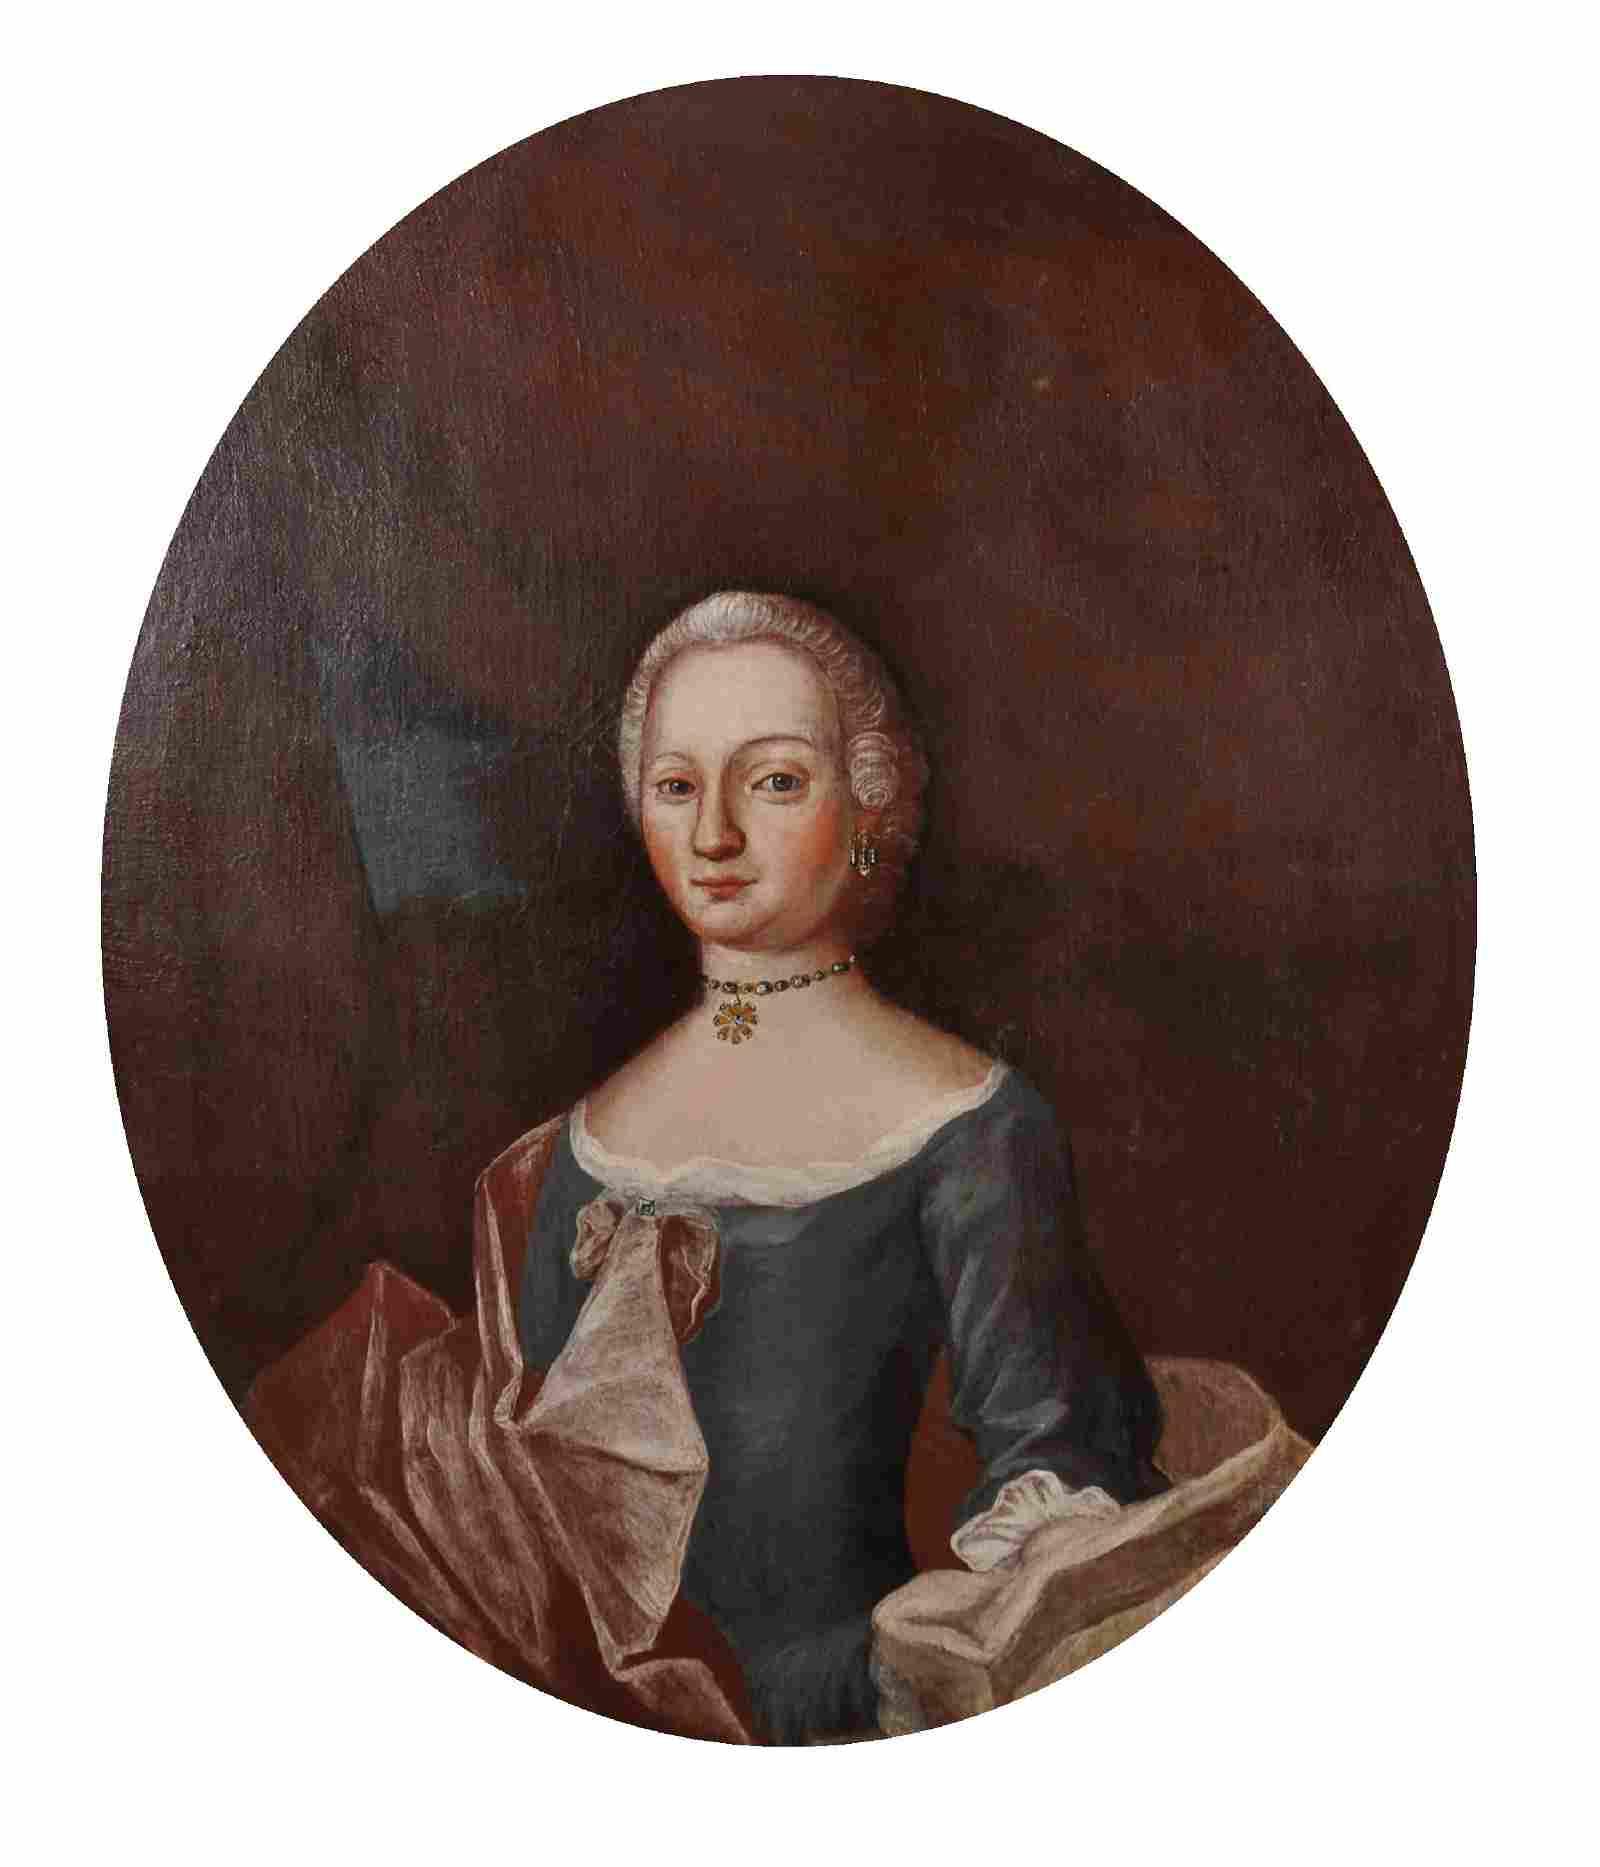 18th Century German School. Half Length Portrait of an